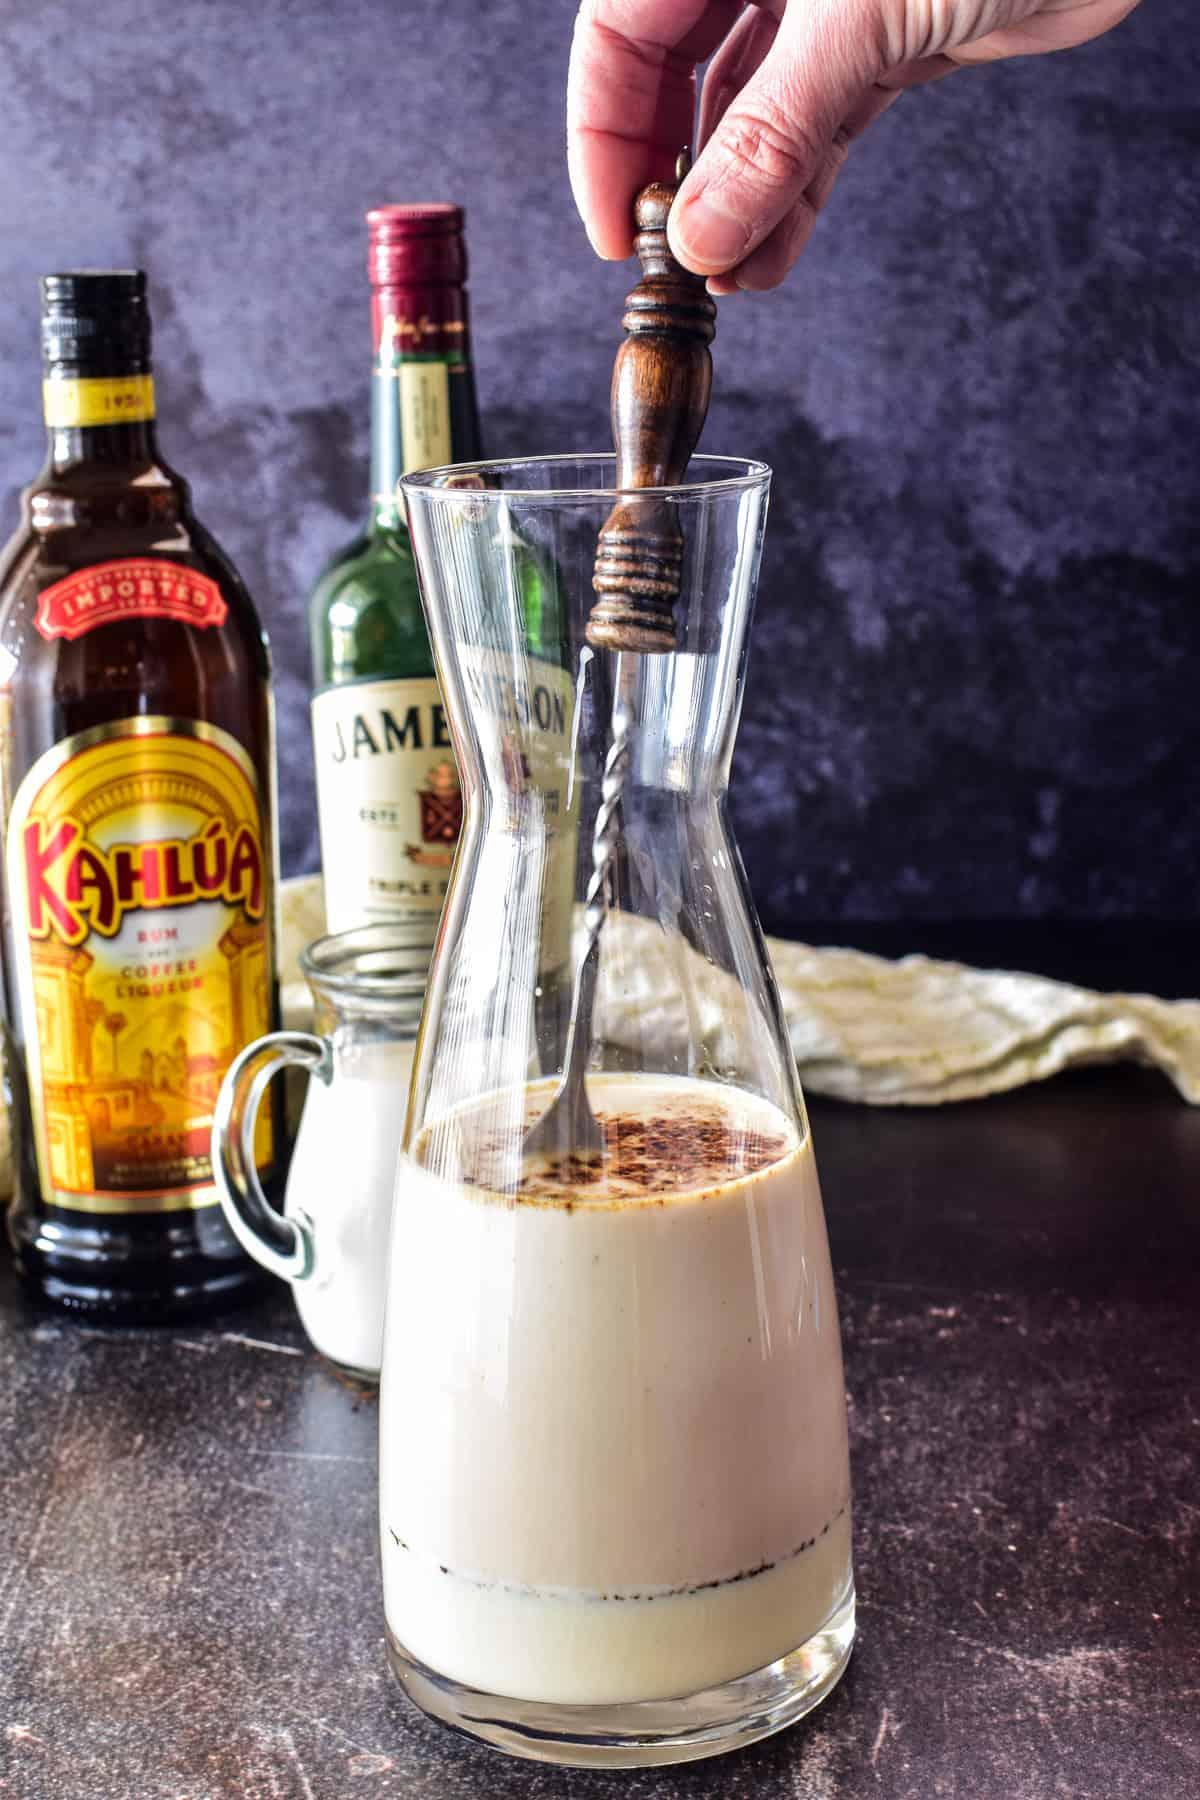 Stirring Irish Cream ingredient in carafe